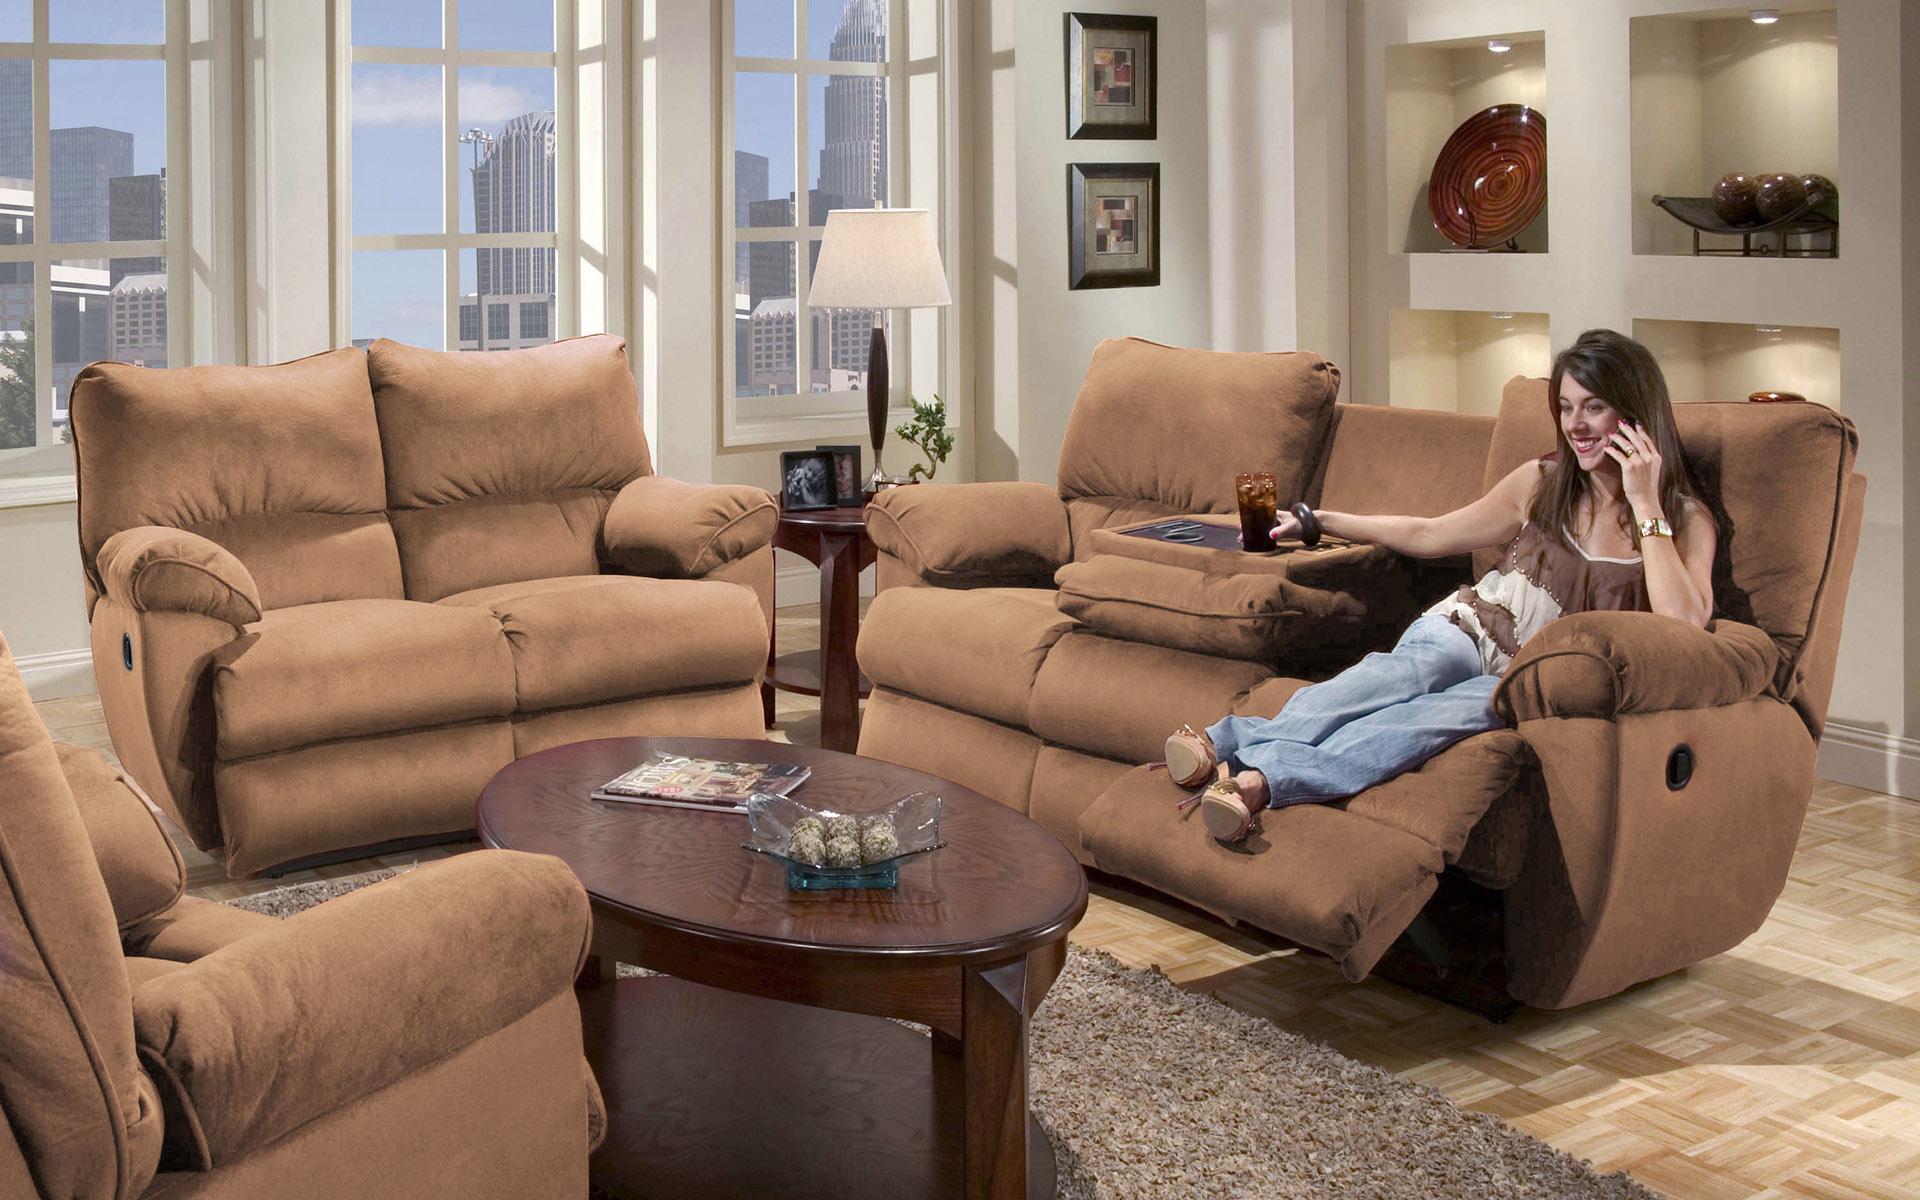 Living_room_luxuious-sofaset Living room luxuious sofaset